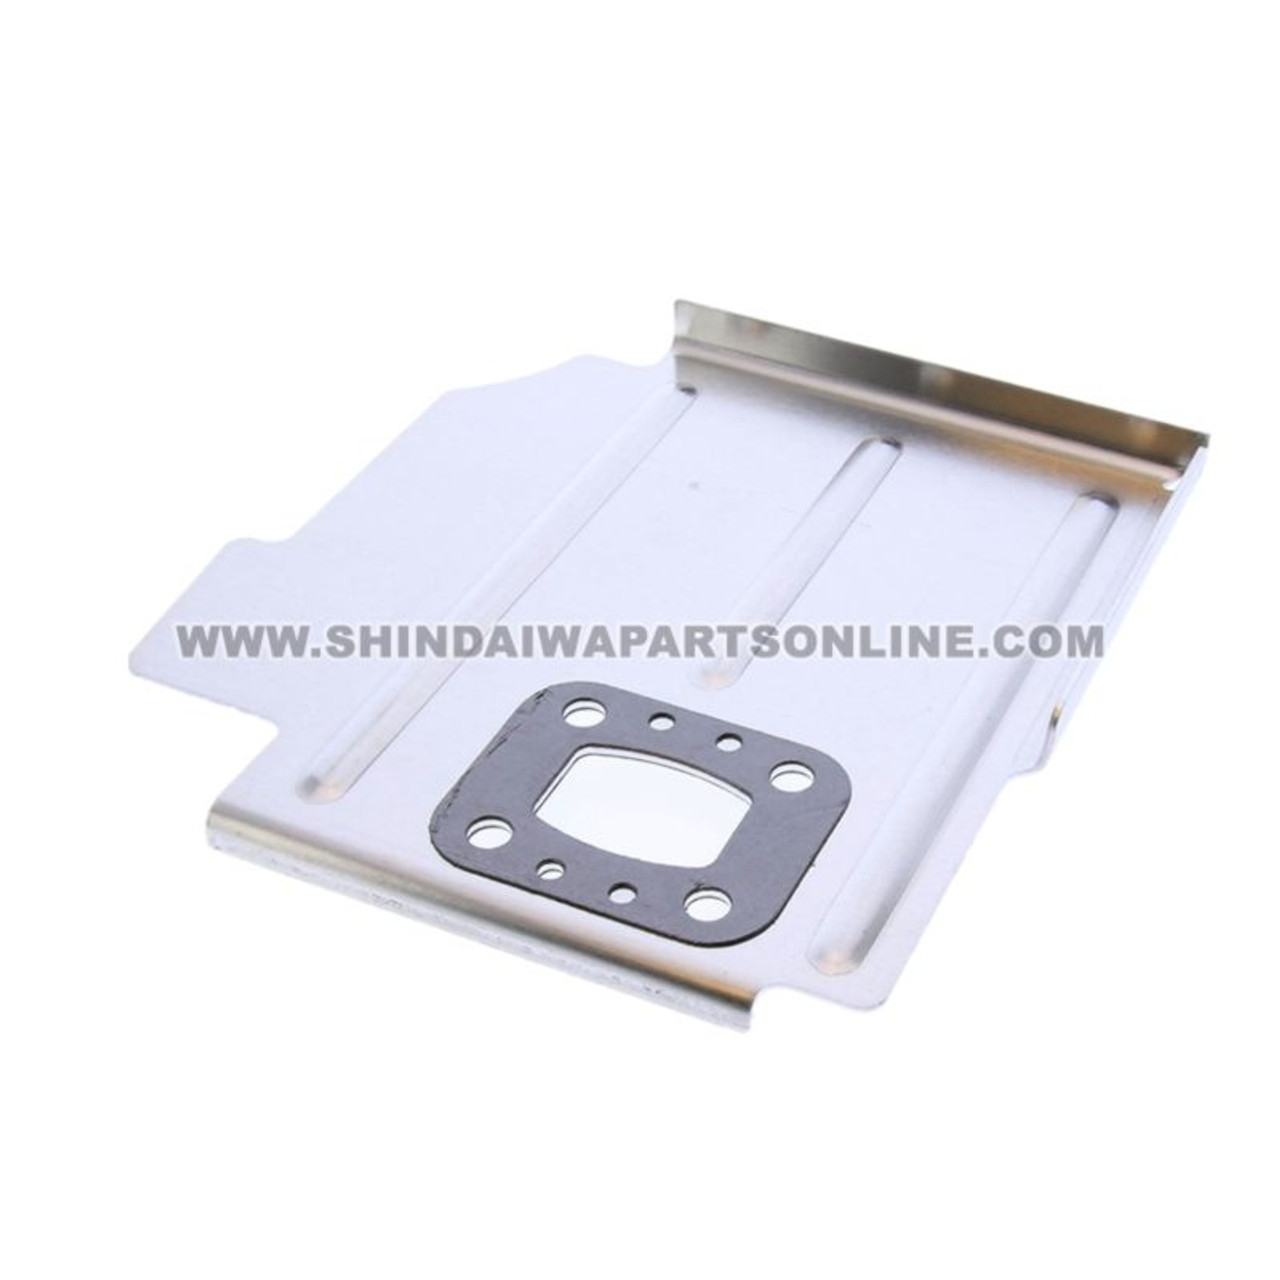 SHINDAIWA Assy Intake Heat Deflector A209000230 - Image 1